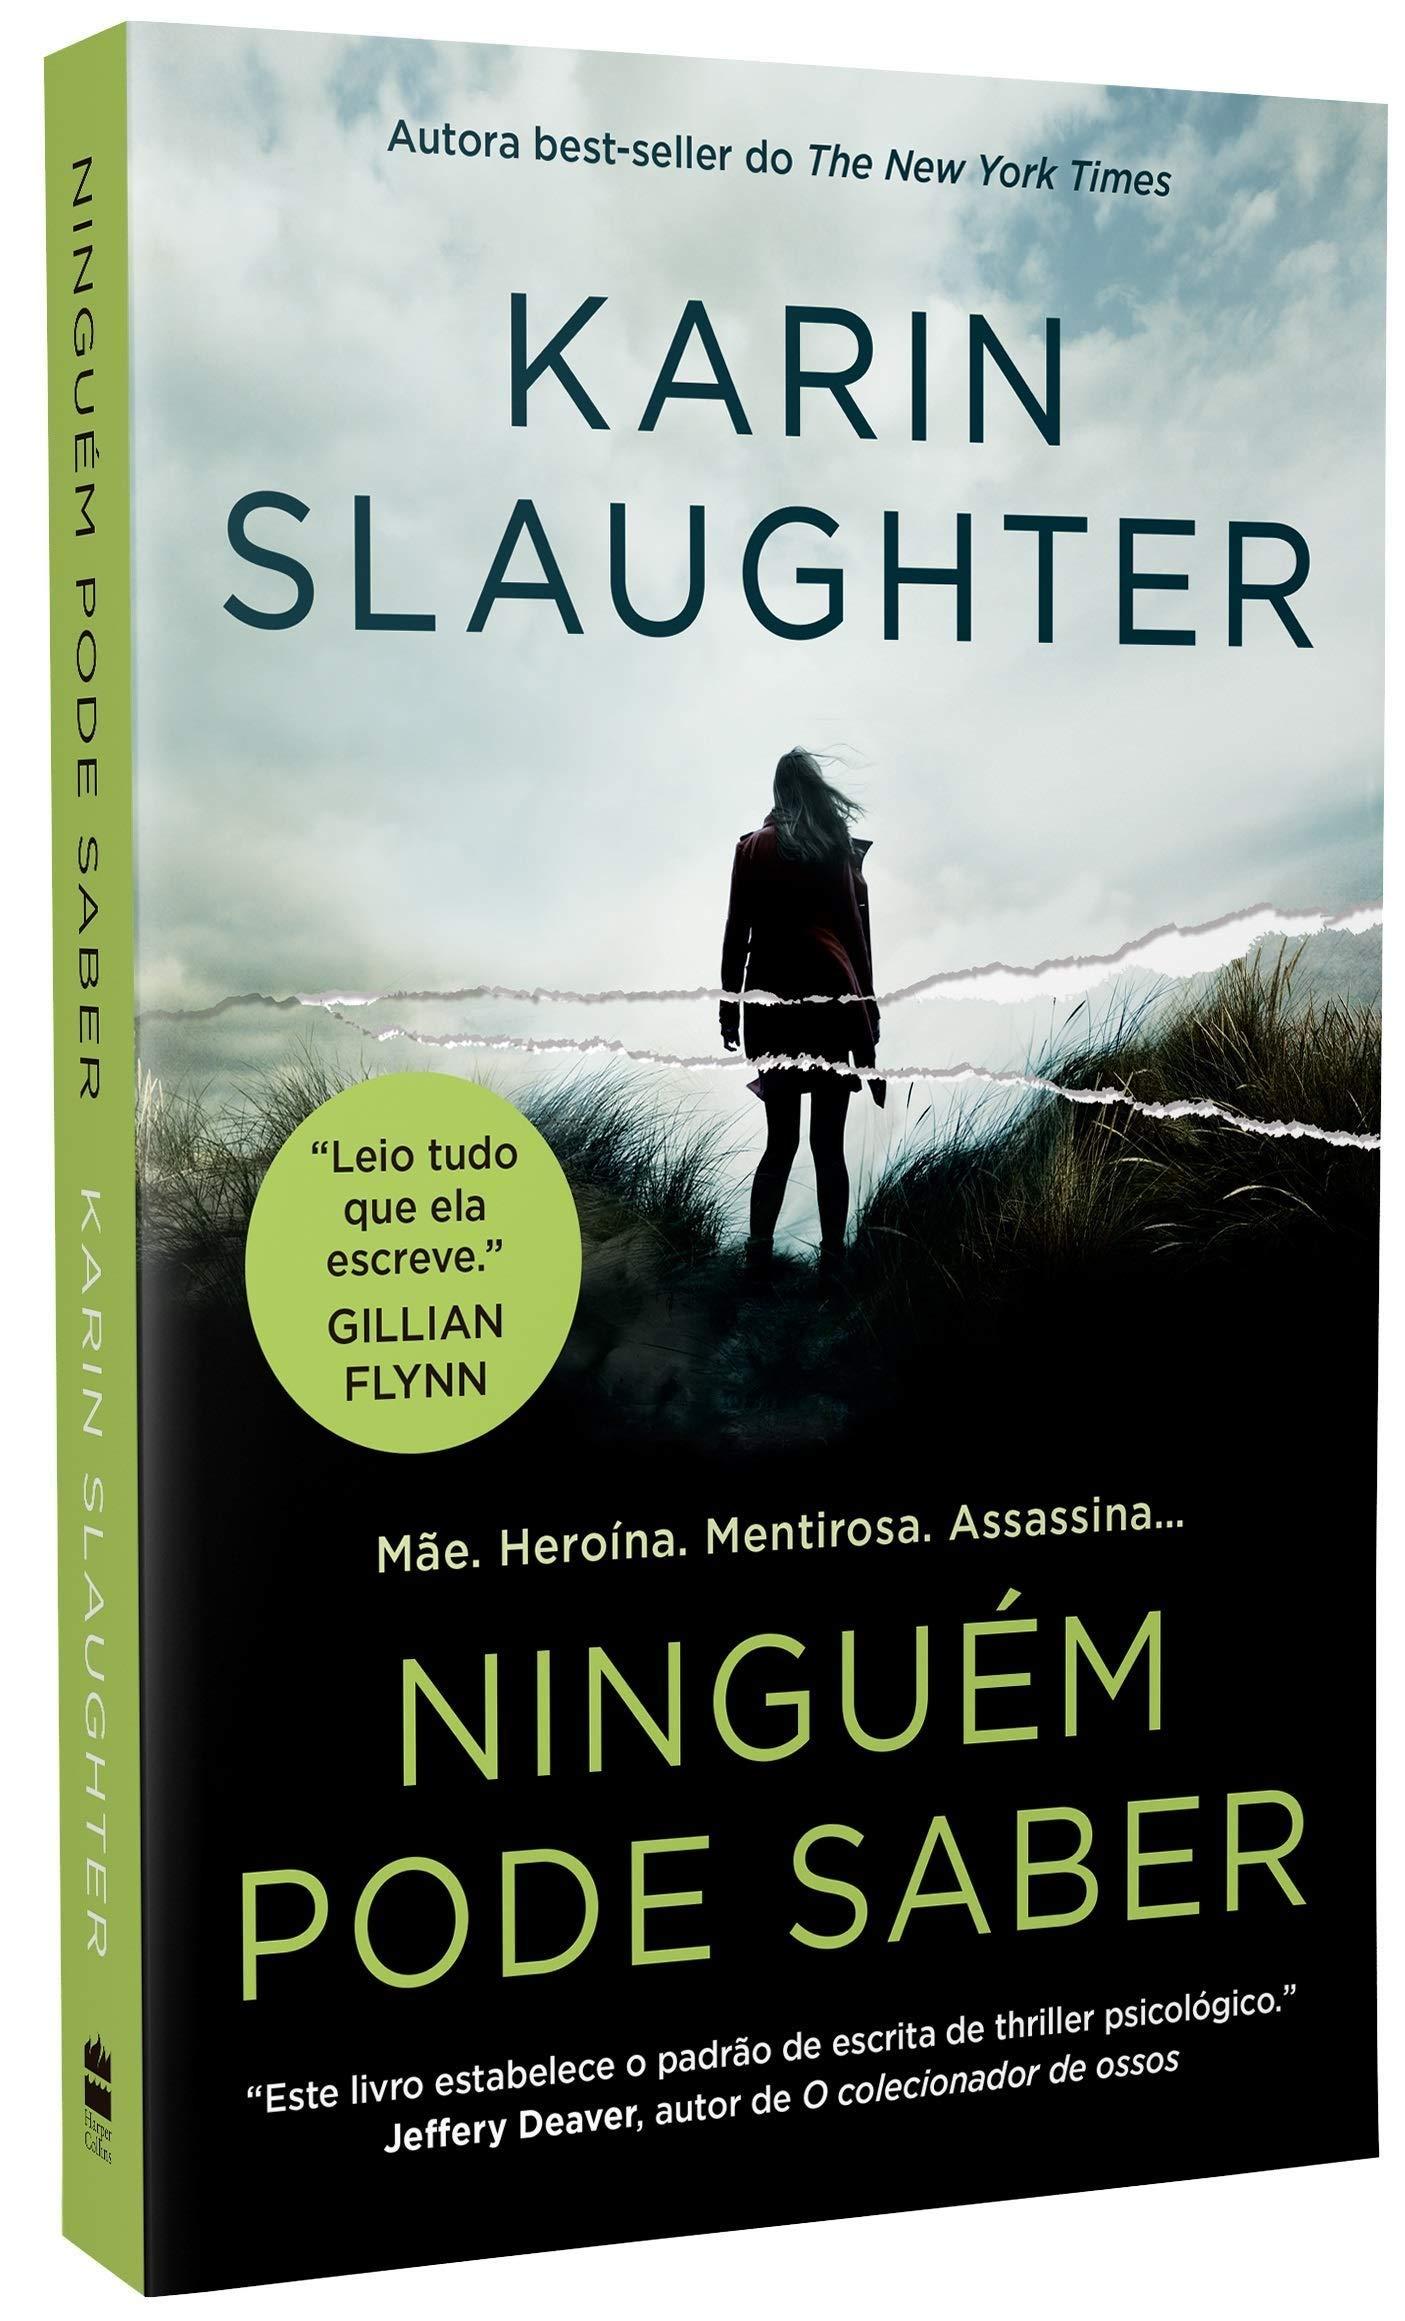 Ninguém pode saber - 9788595084544 - Livros na Amazon Brasil